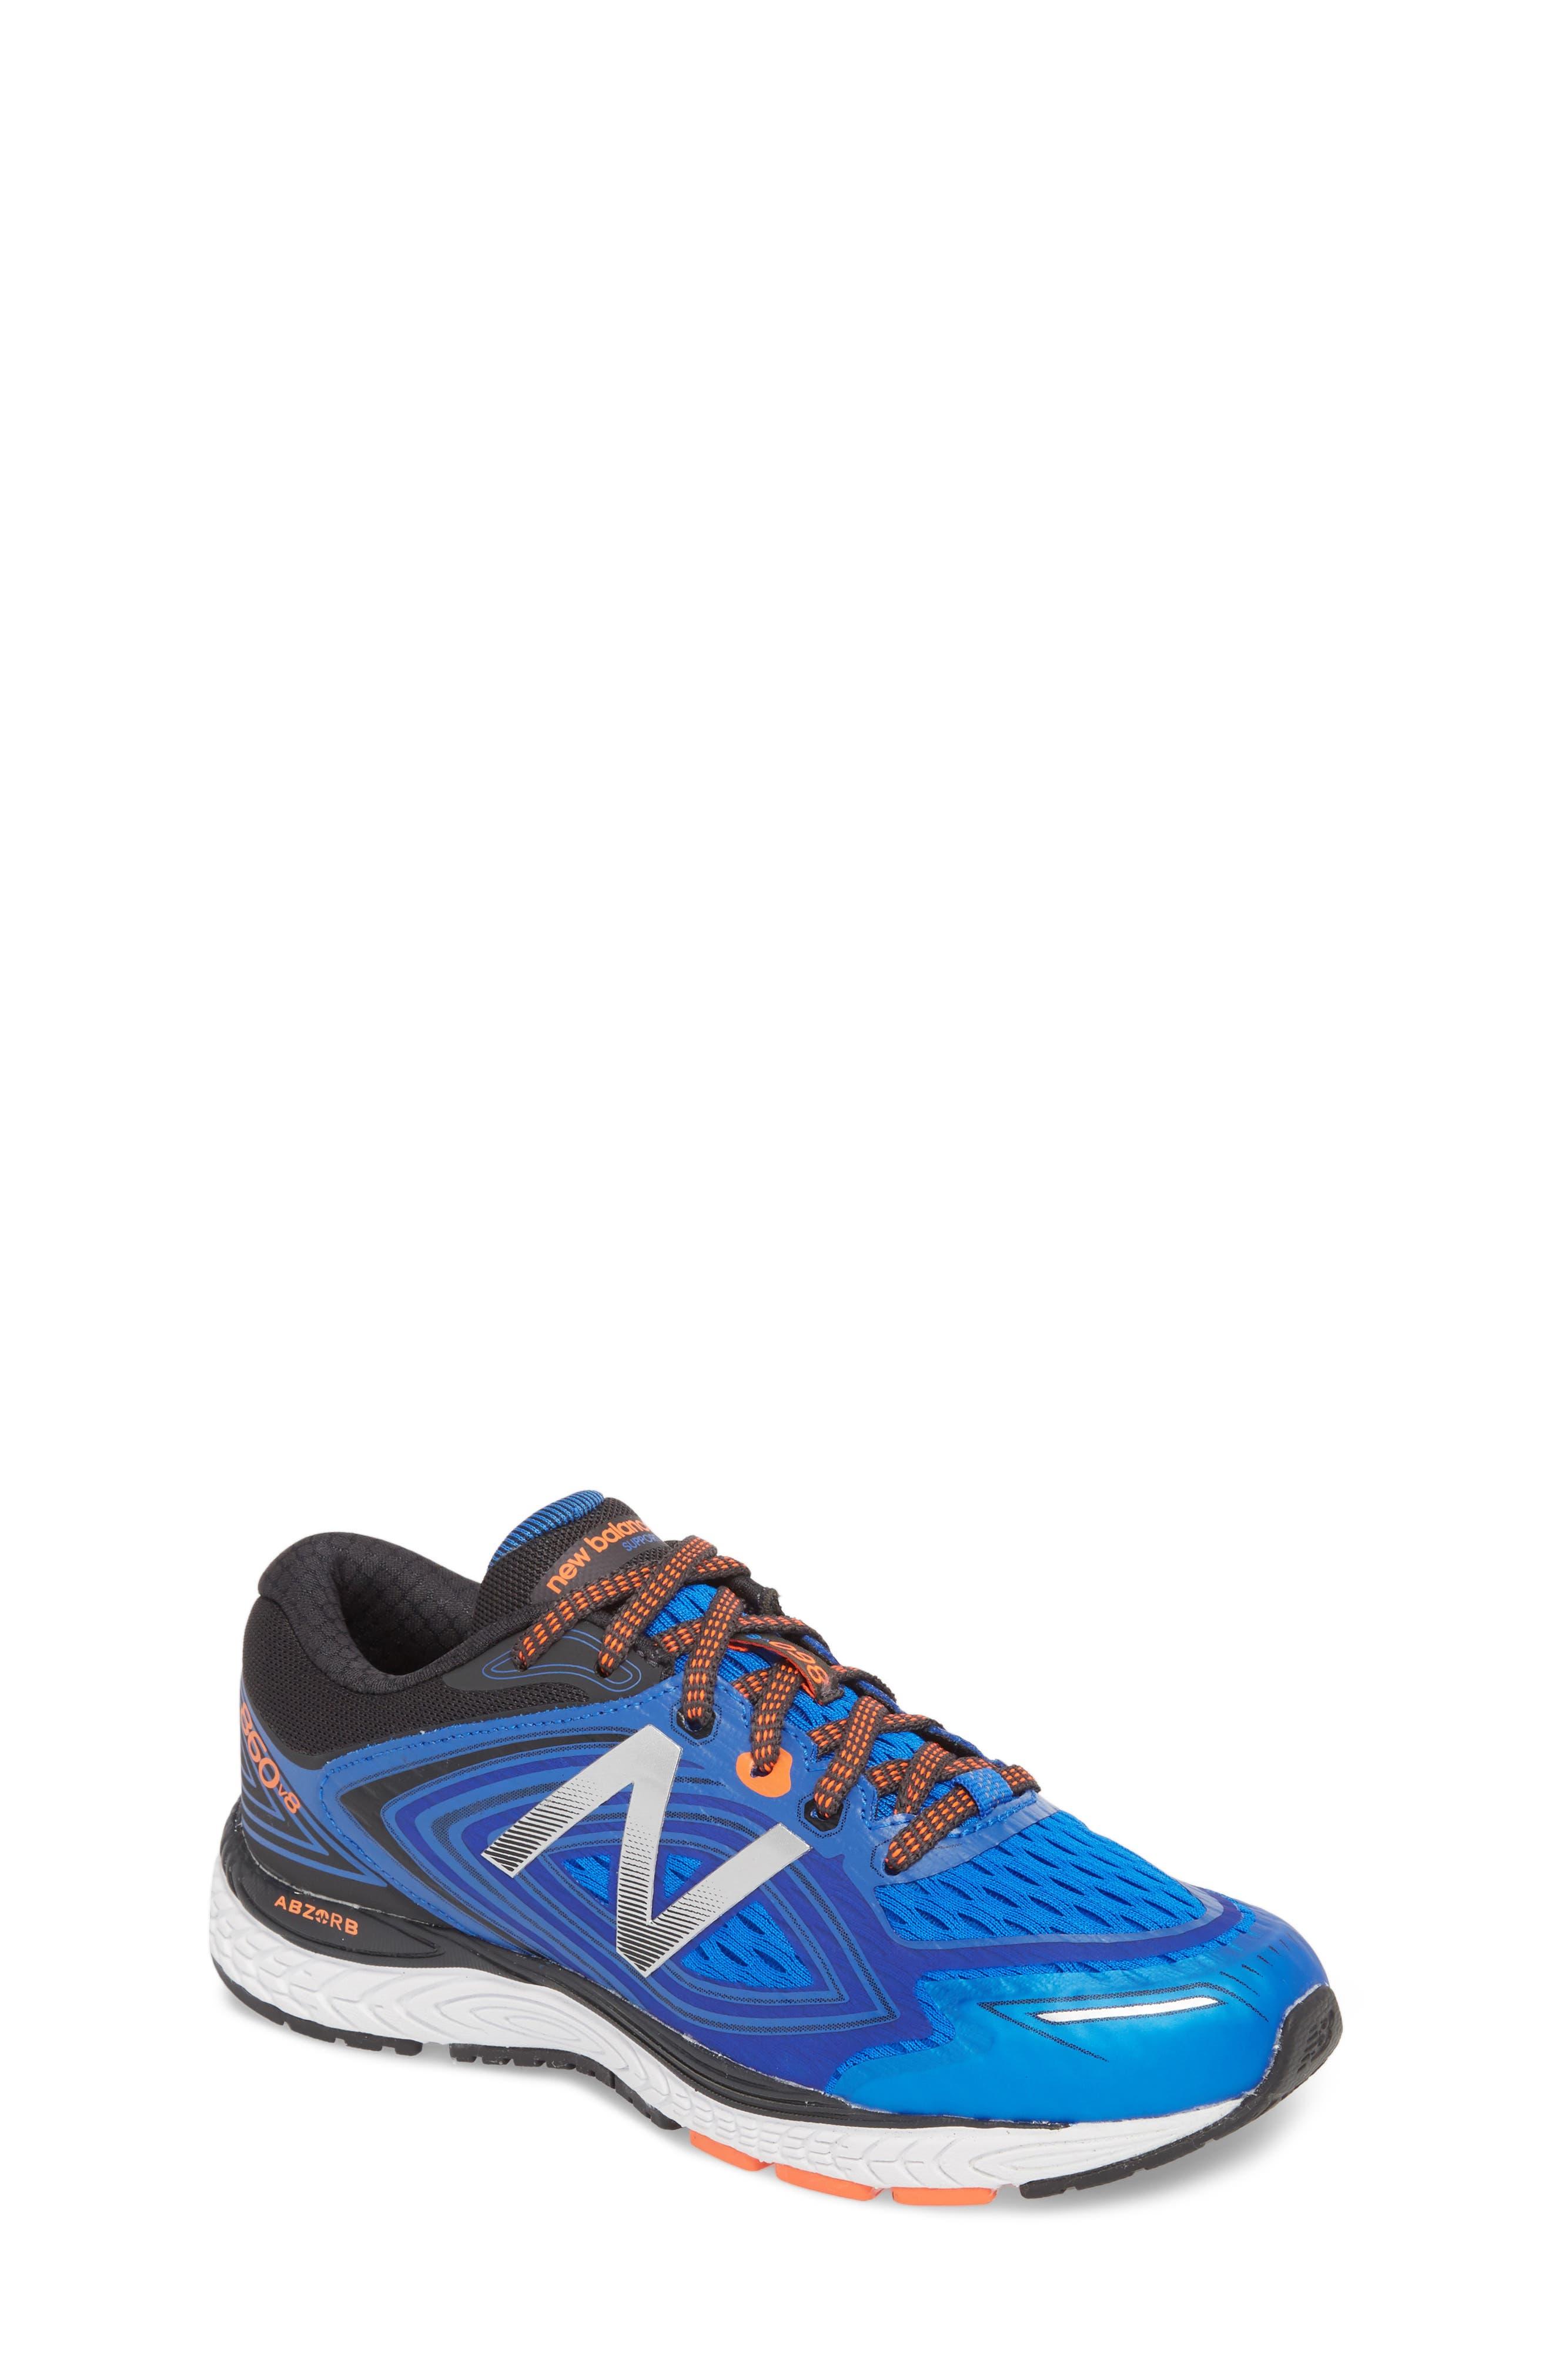 860v8 Sneaker,                             Main thumbnail 1, color,                             432